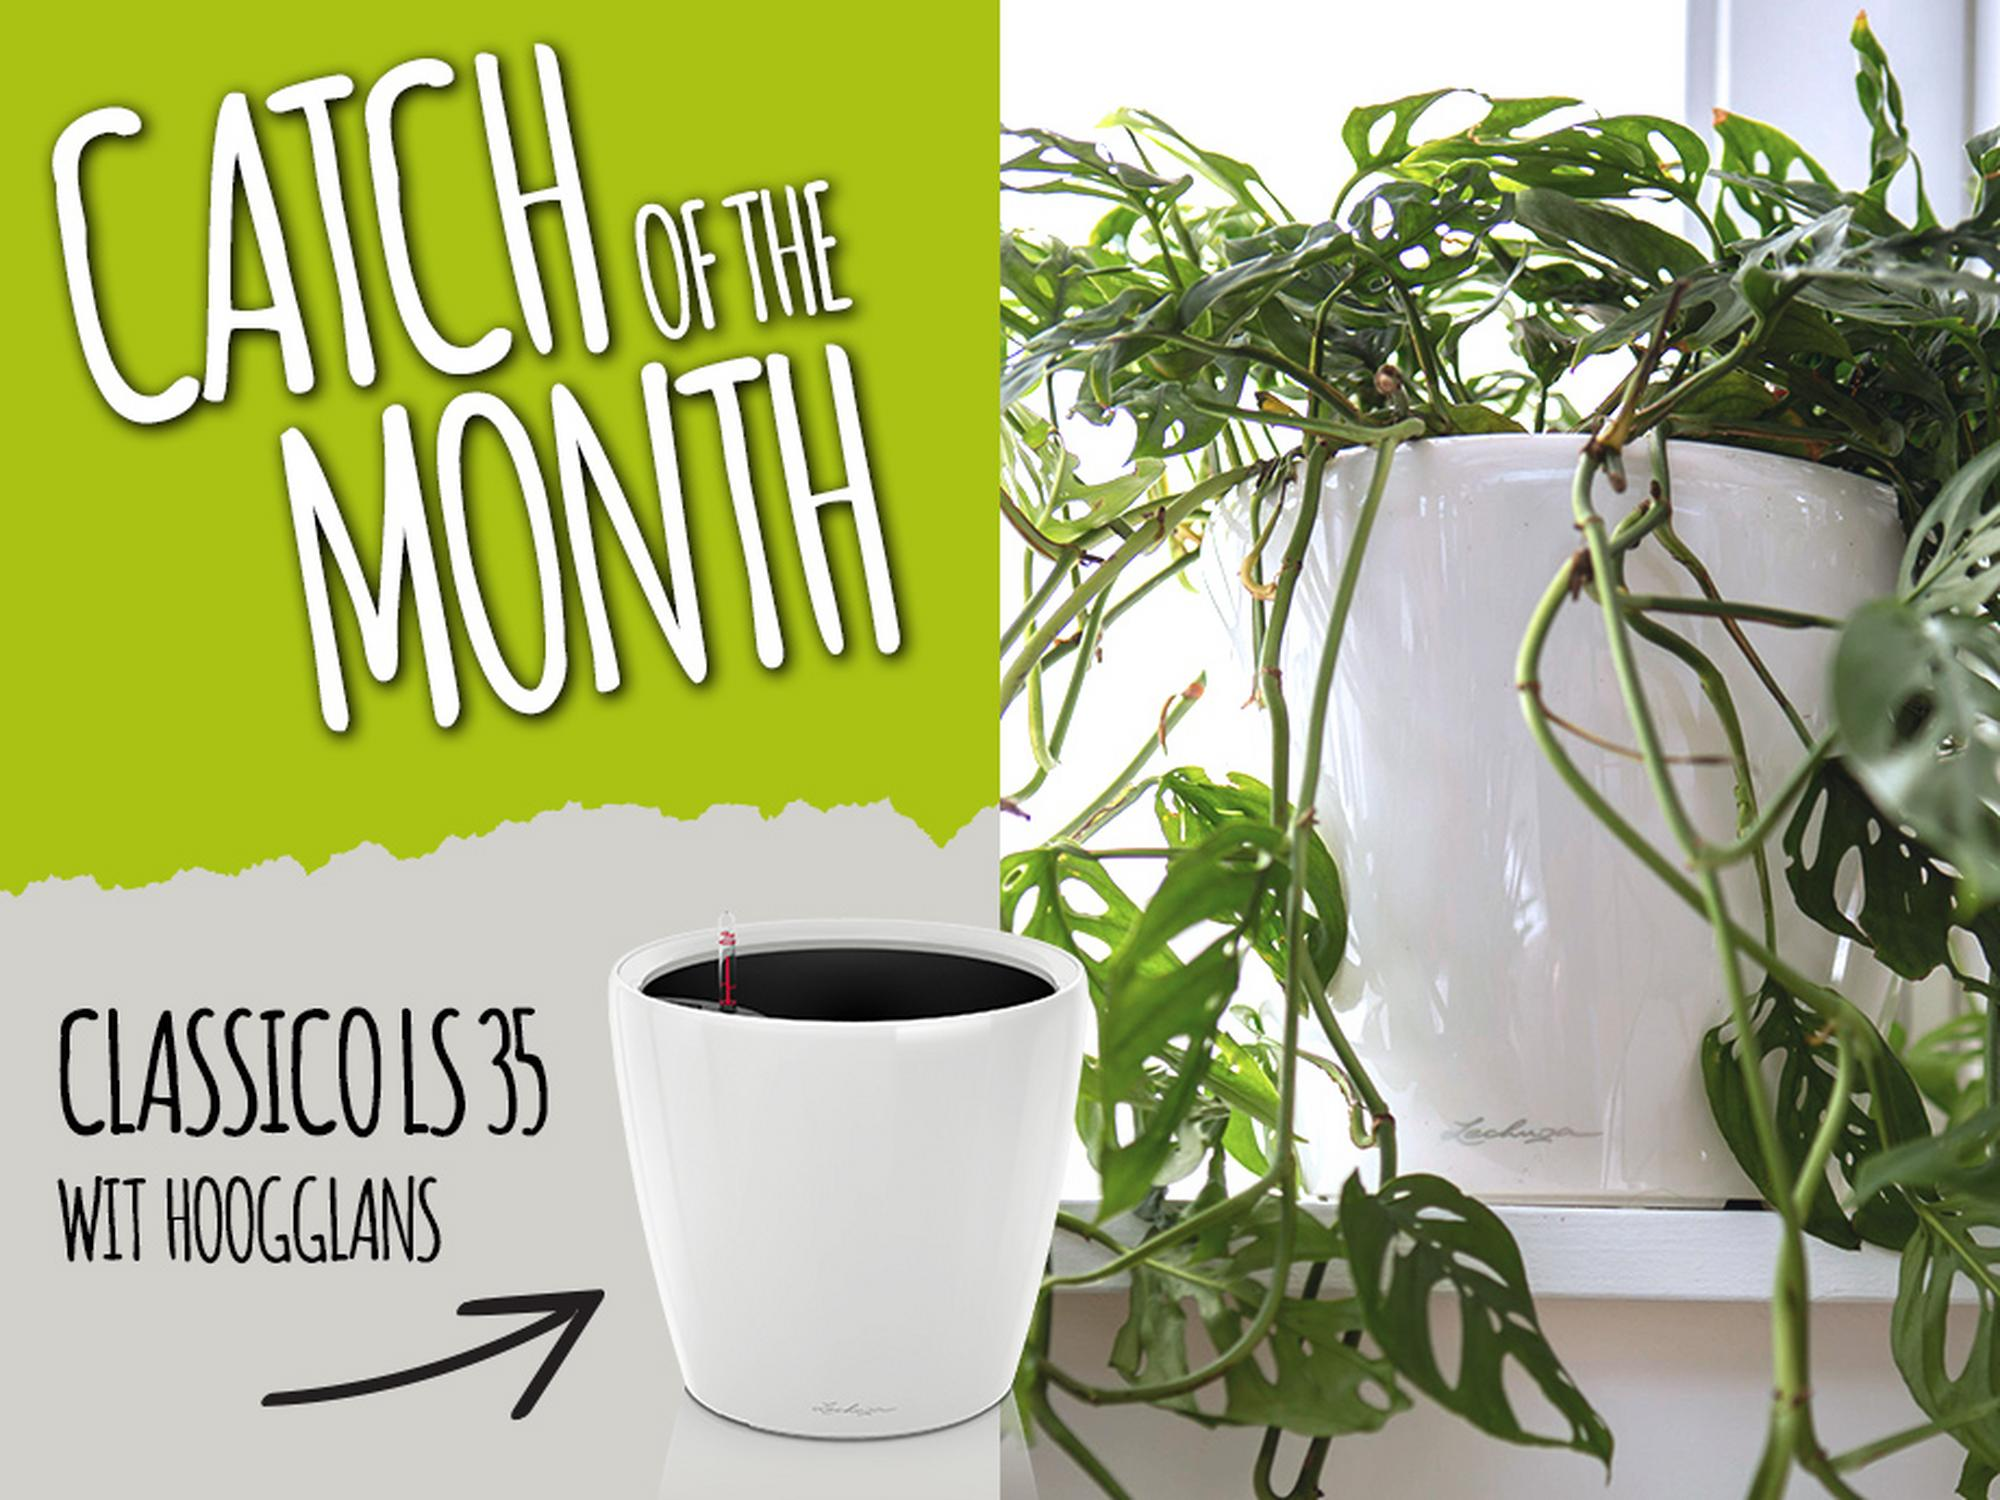 Catch of the Month: 15% korting op de CLASSICO LS 35 in wit